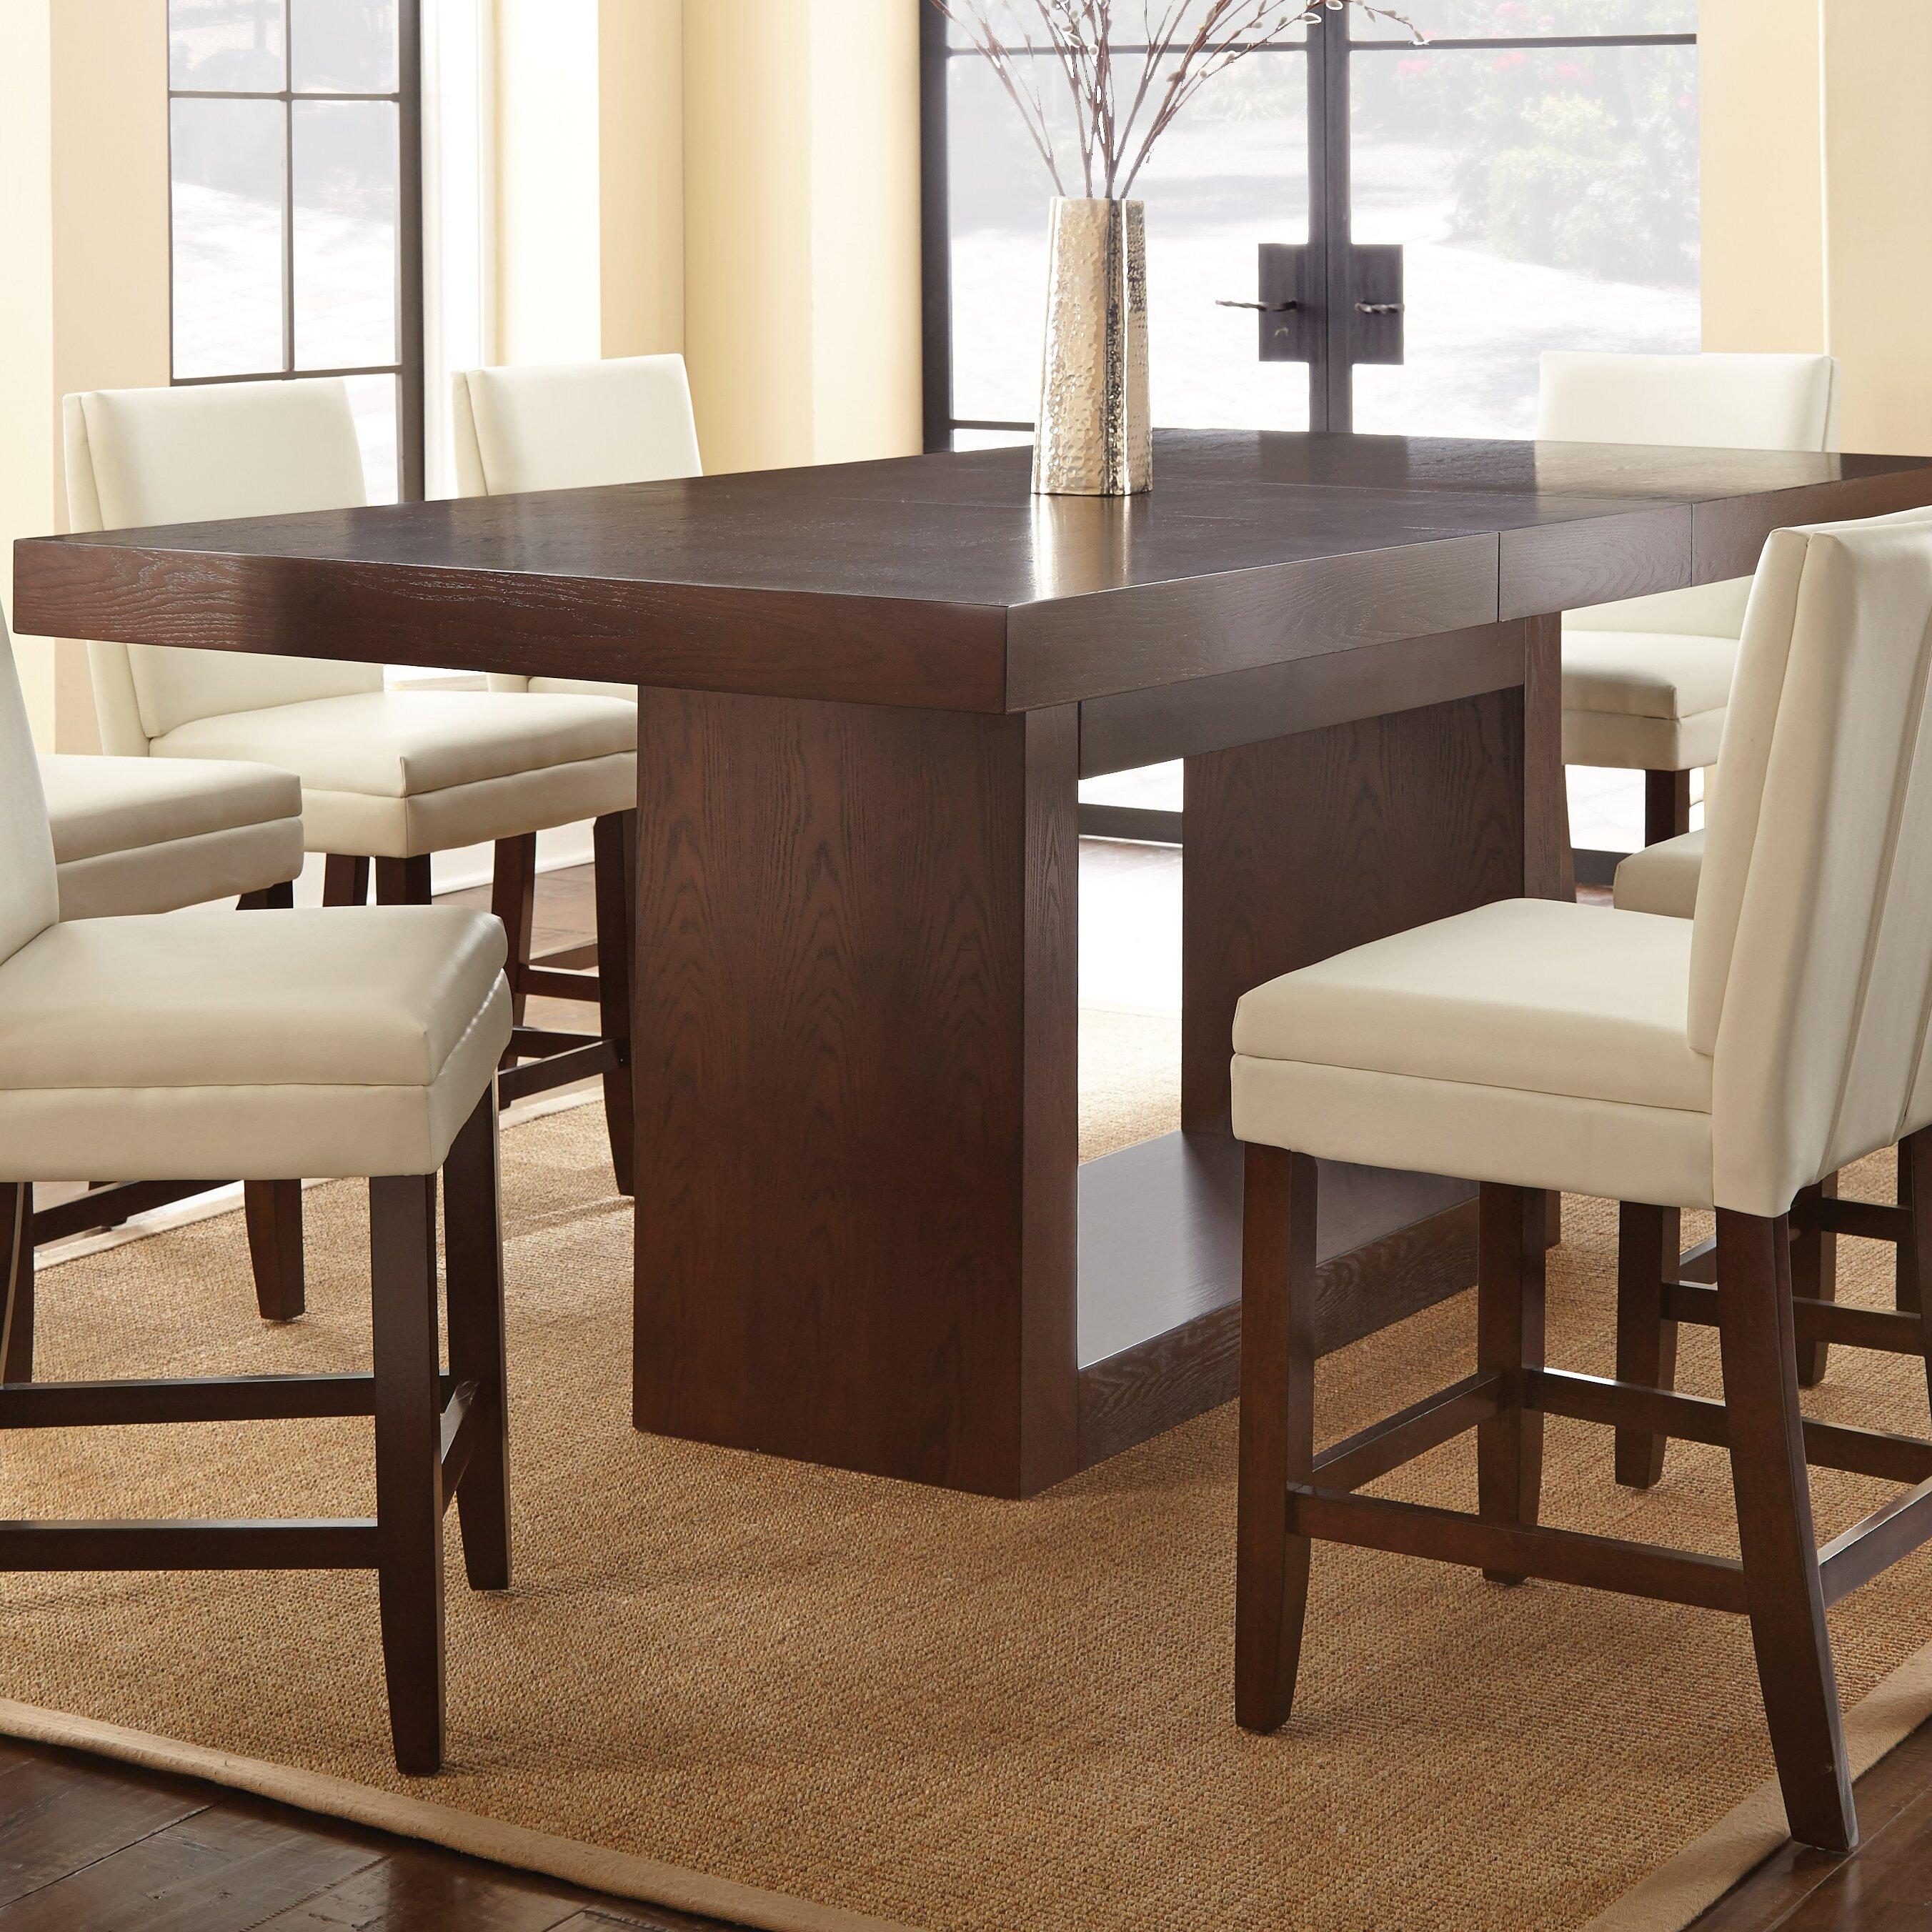 Brayden studio maust counter height dining table reviews wayfair